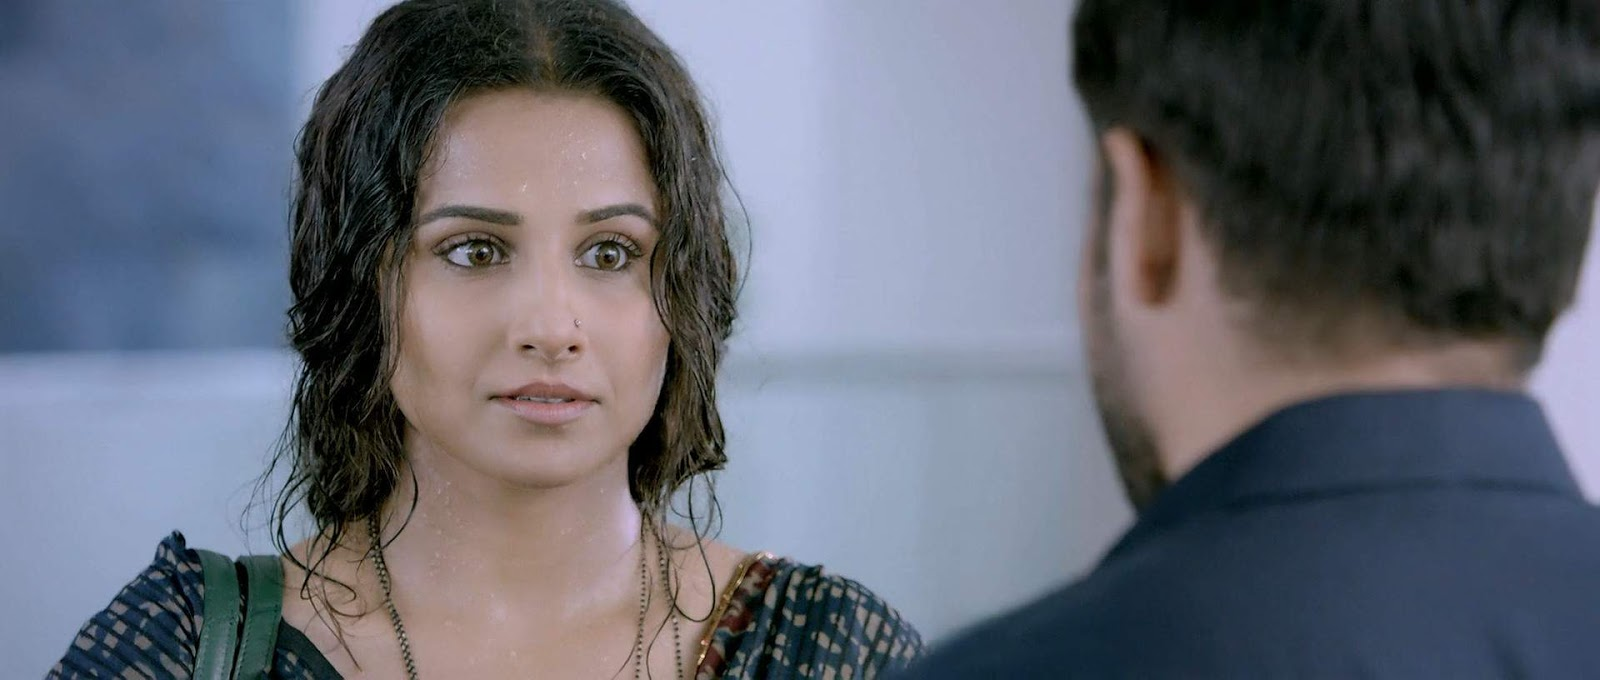 Hamari Adhuri Kahaani (2015)